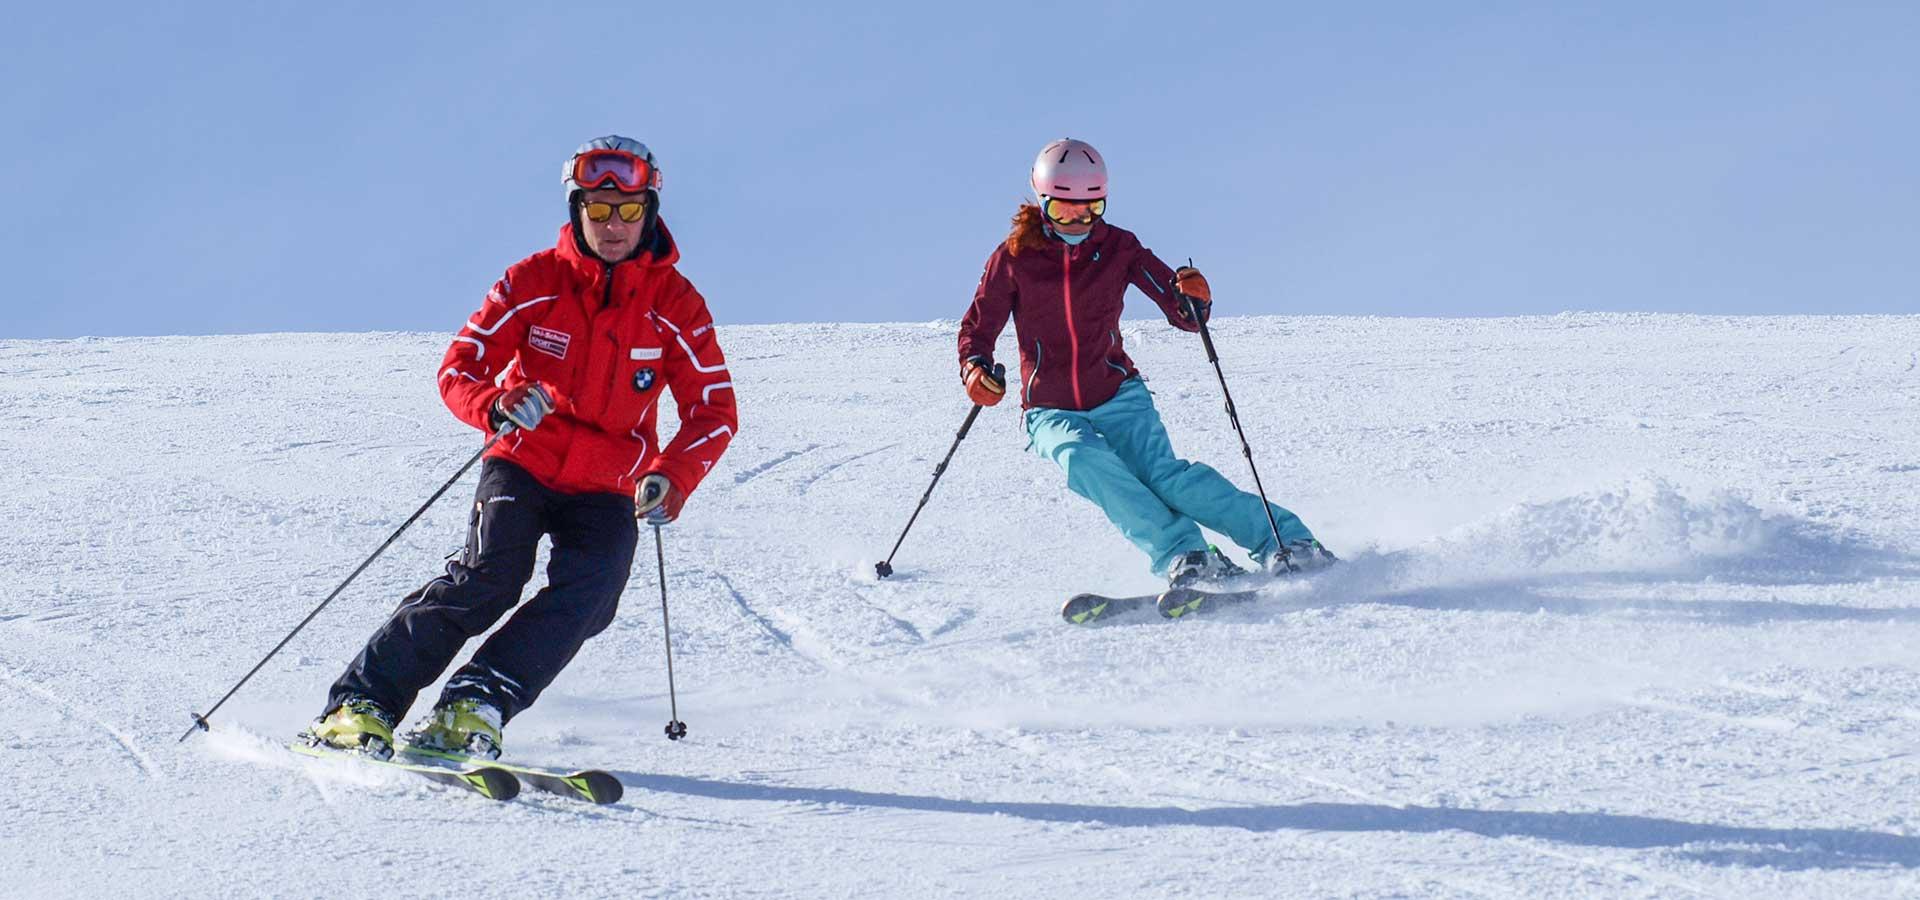 Skilaufen in Seefeld